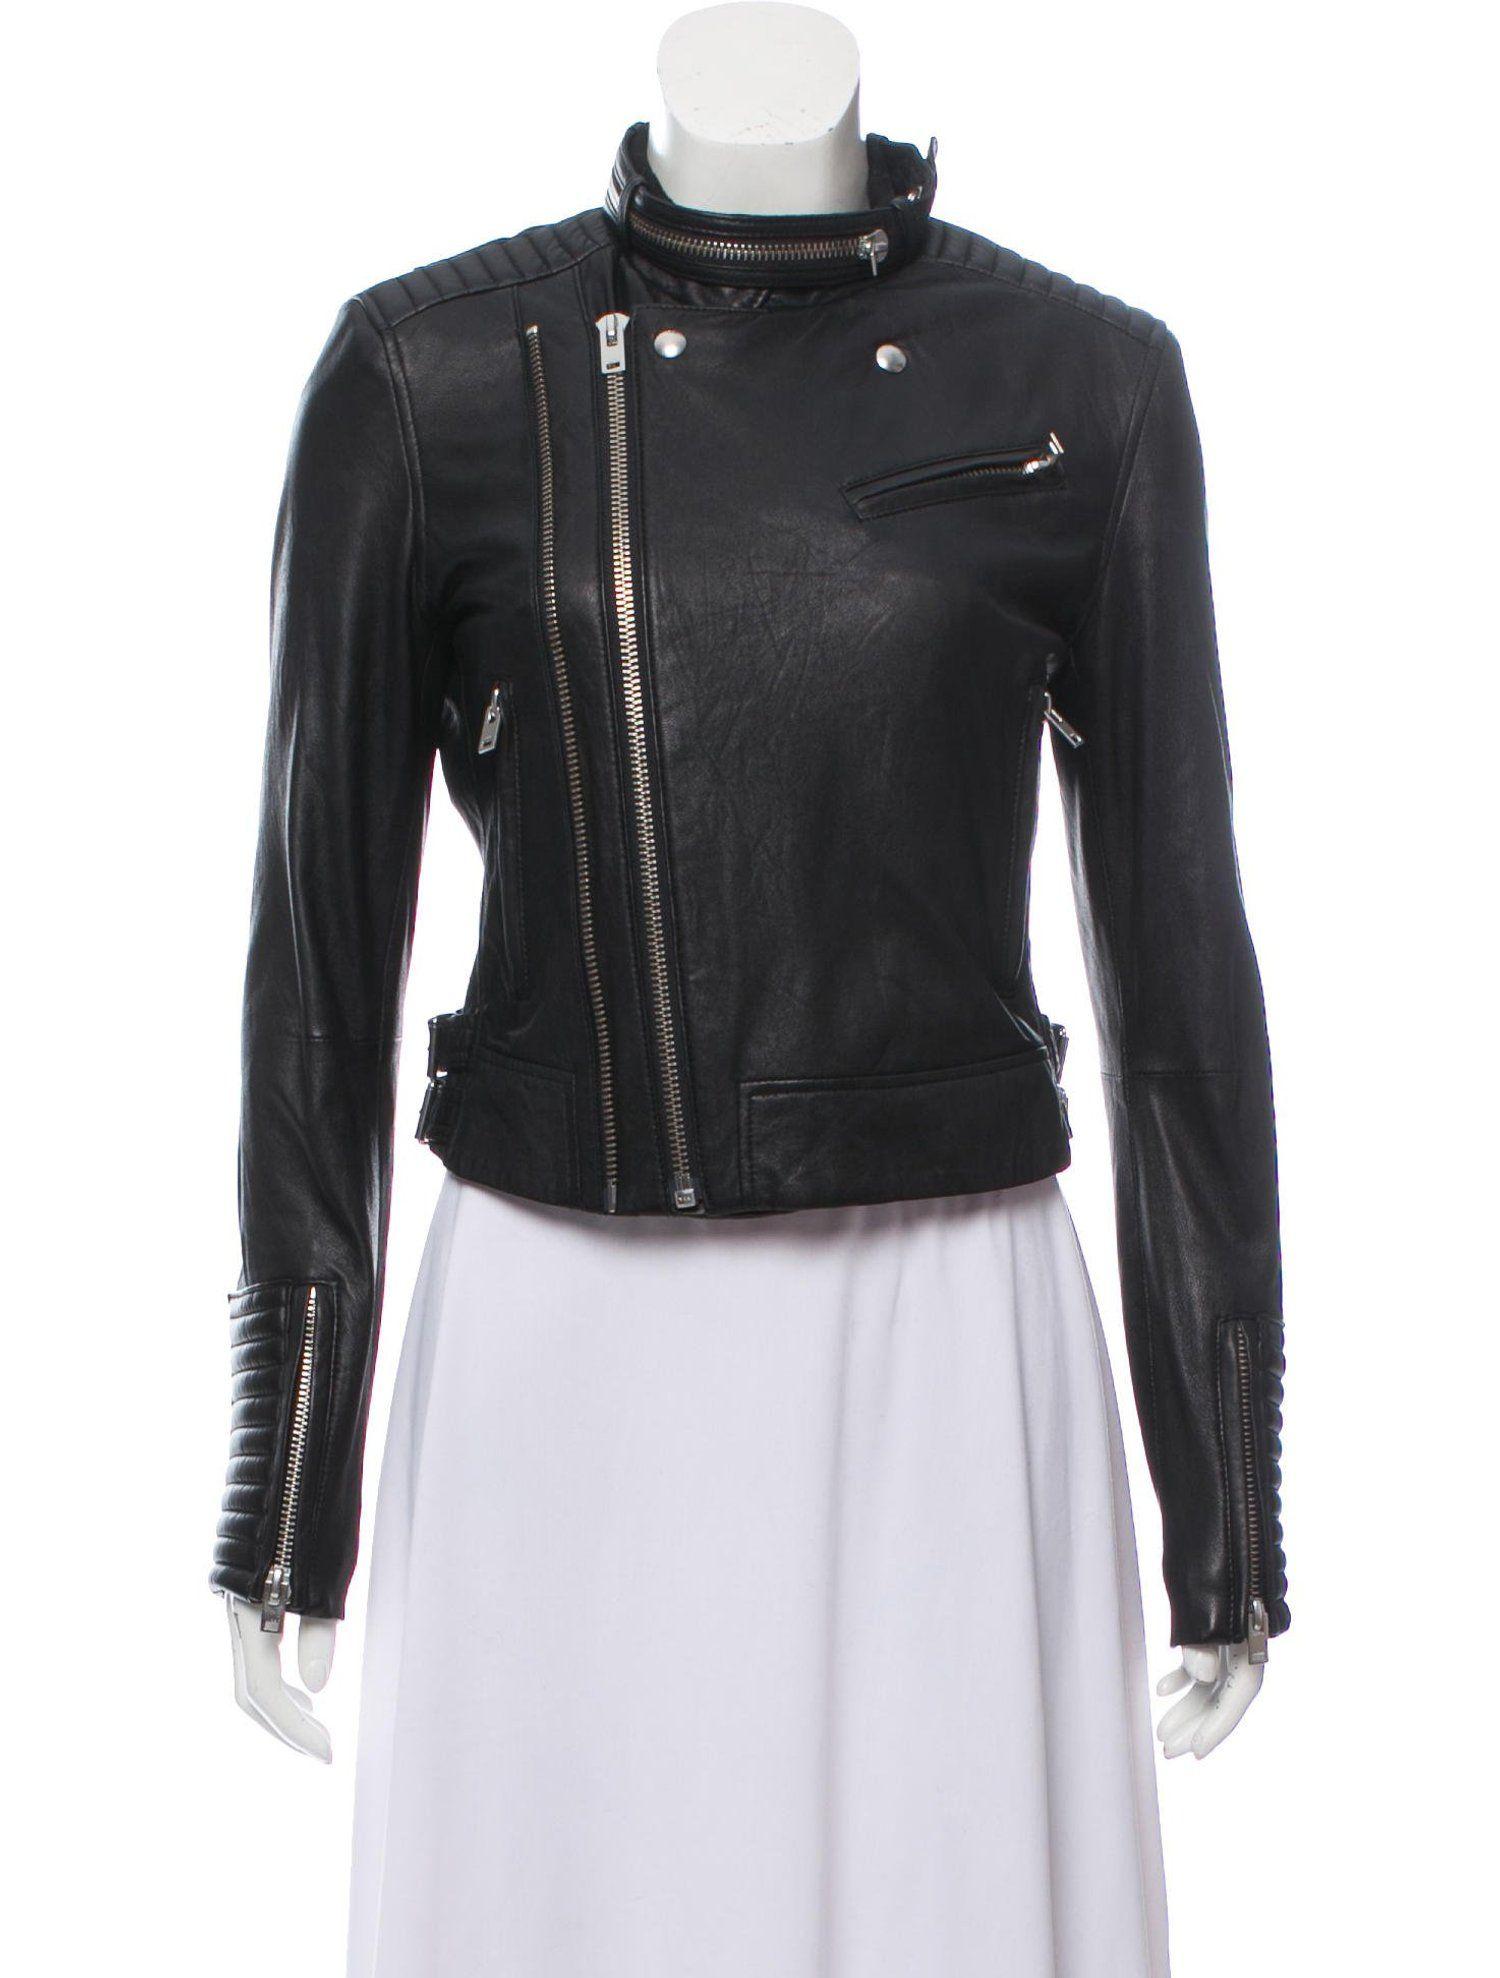 Iro Luciaspe Leather Jacket Clothing Wir48707 The Realreal Clothes Leather Jacket Jackets [ 1978 x 1500 Pixel ]